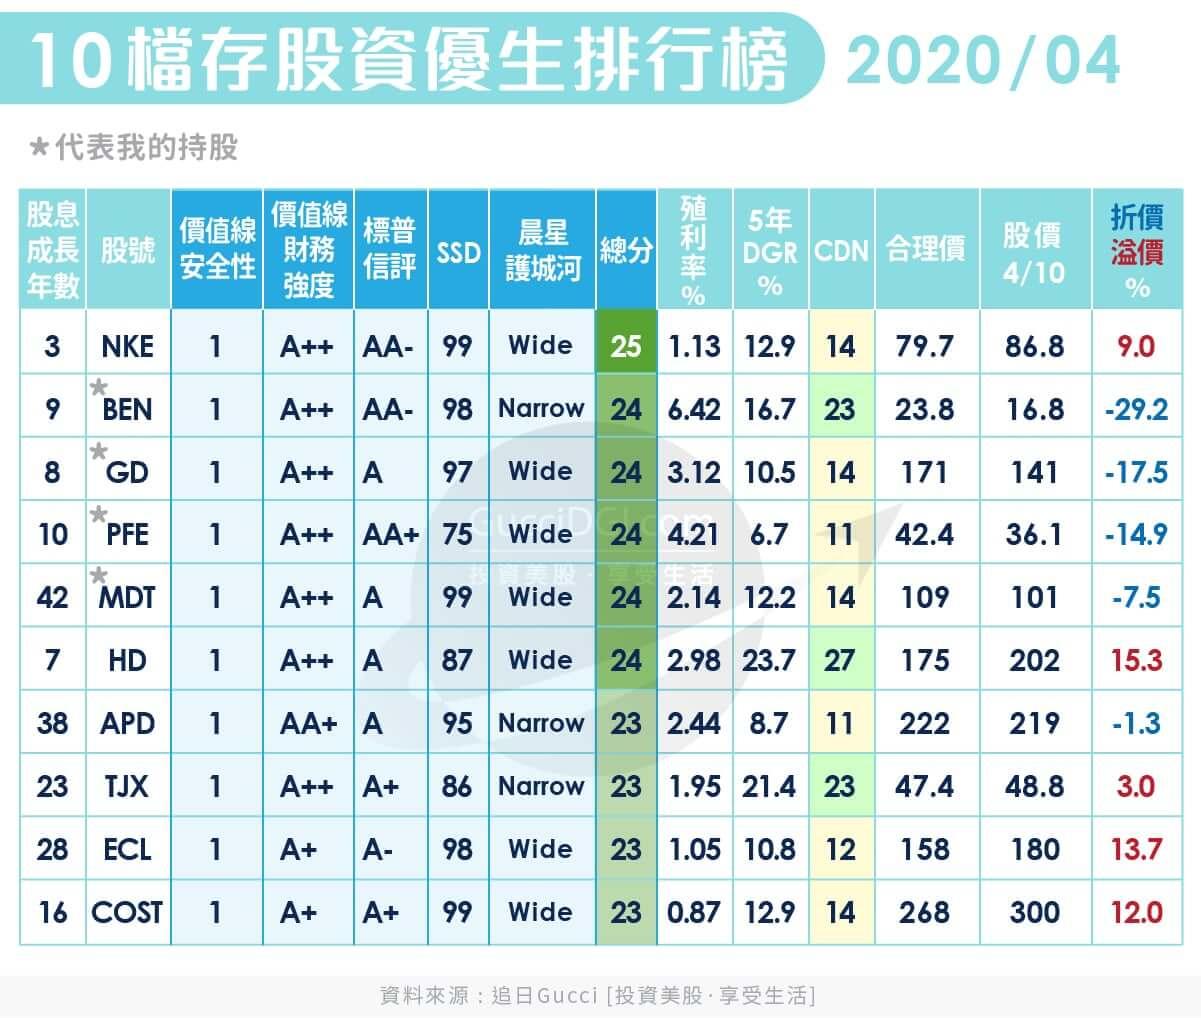 Top10 Dividend Growth 2020 April